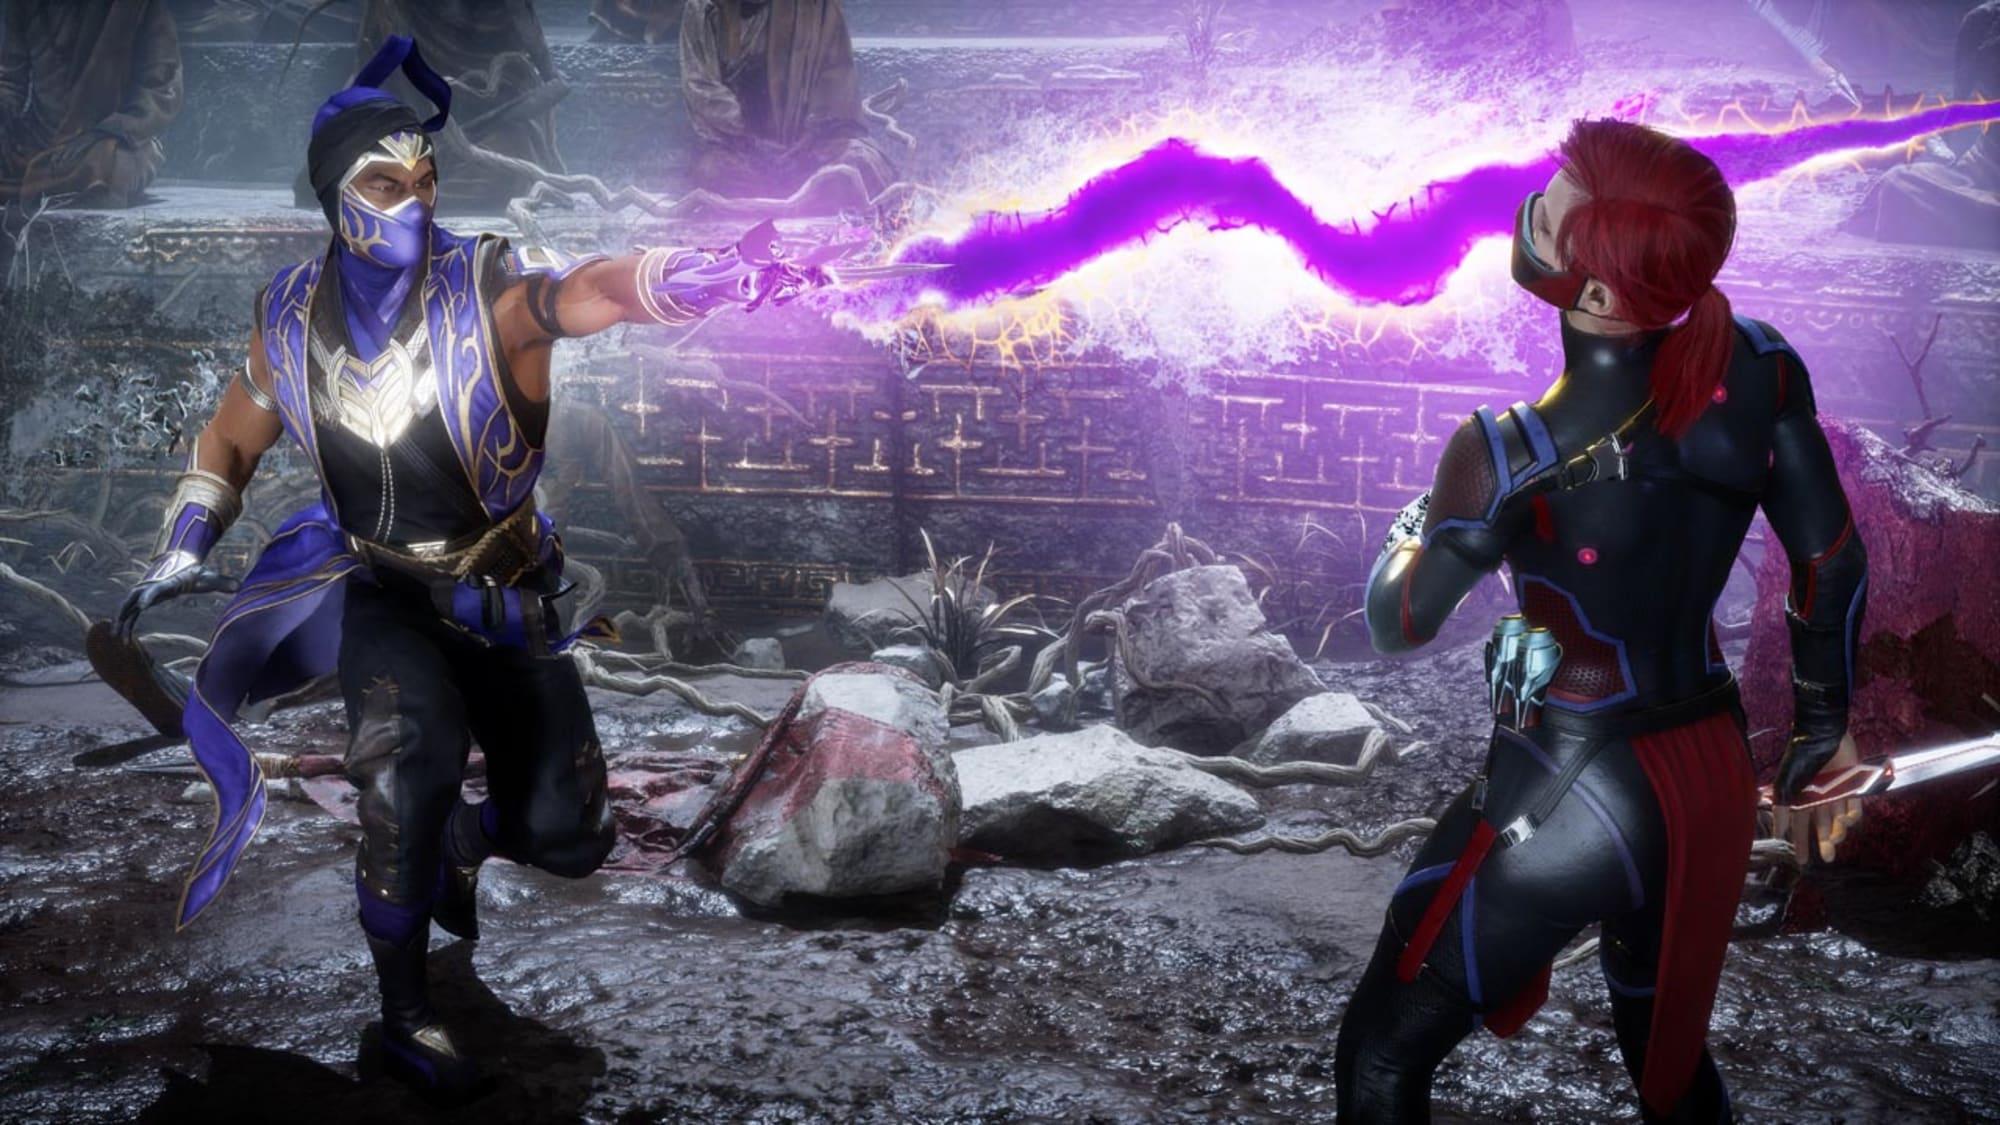 Mortal Kombat 11 Ultimate overview: Bigger, better and next-gen